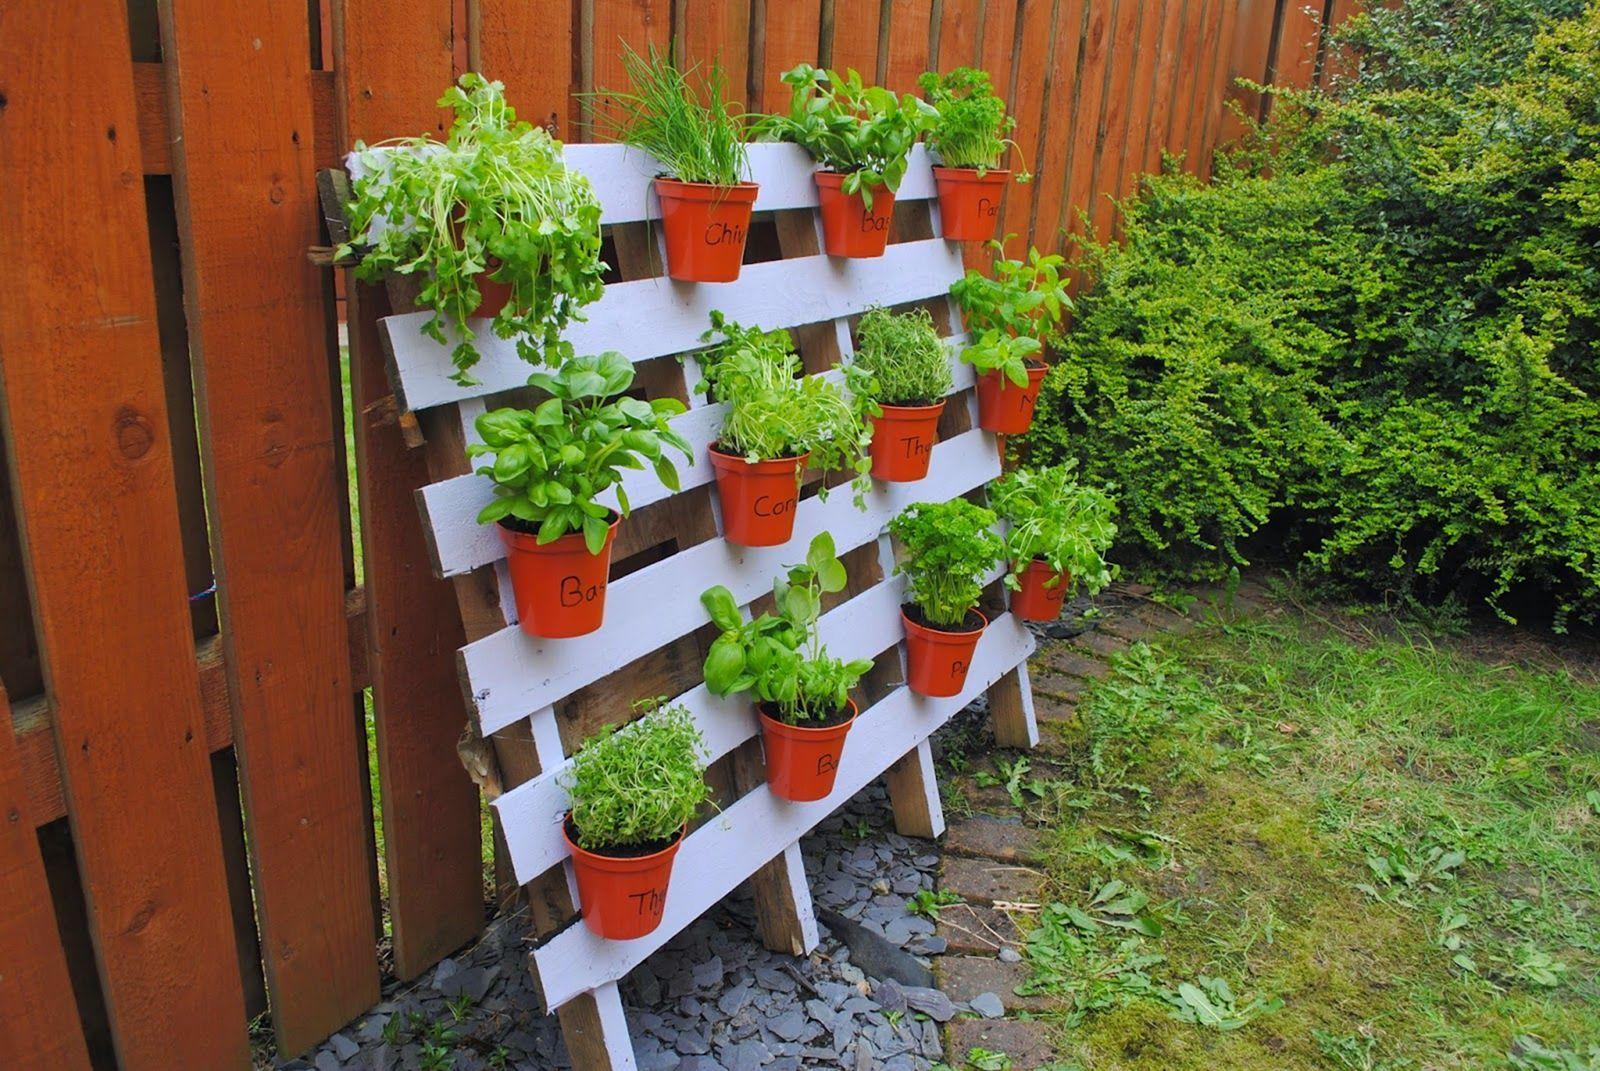 15 Affordable Diy Garden Ideas That Make Your Home Yard Amazing Diy Herb Garden Pallets Garden Diy Wood Planter Box